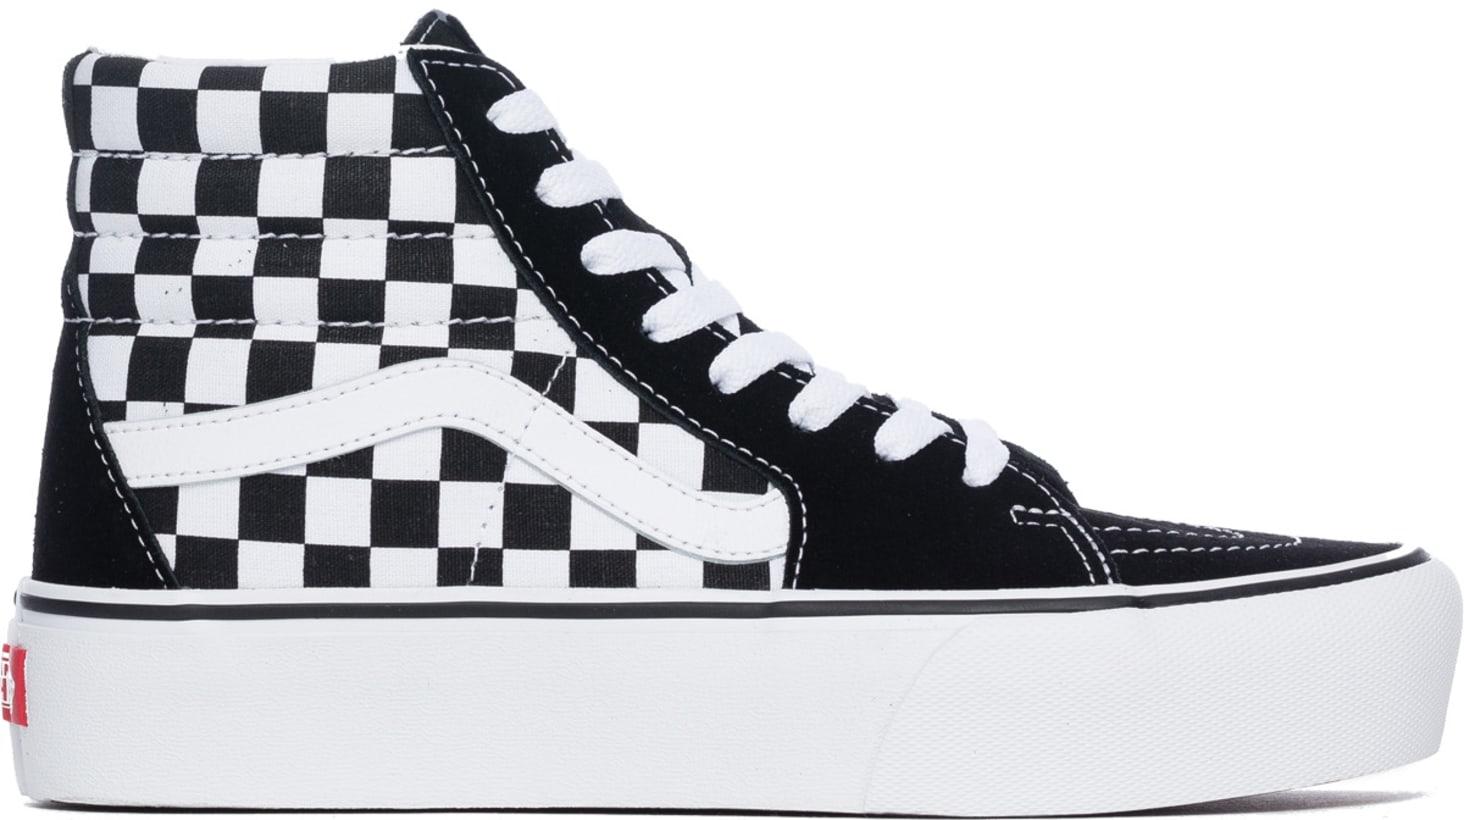 2e4170252 Vans: SK8-Hi Platform 2.0 - Checkerboard/True White | influenceu